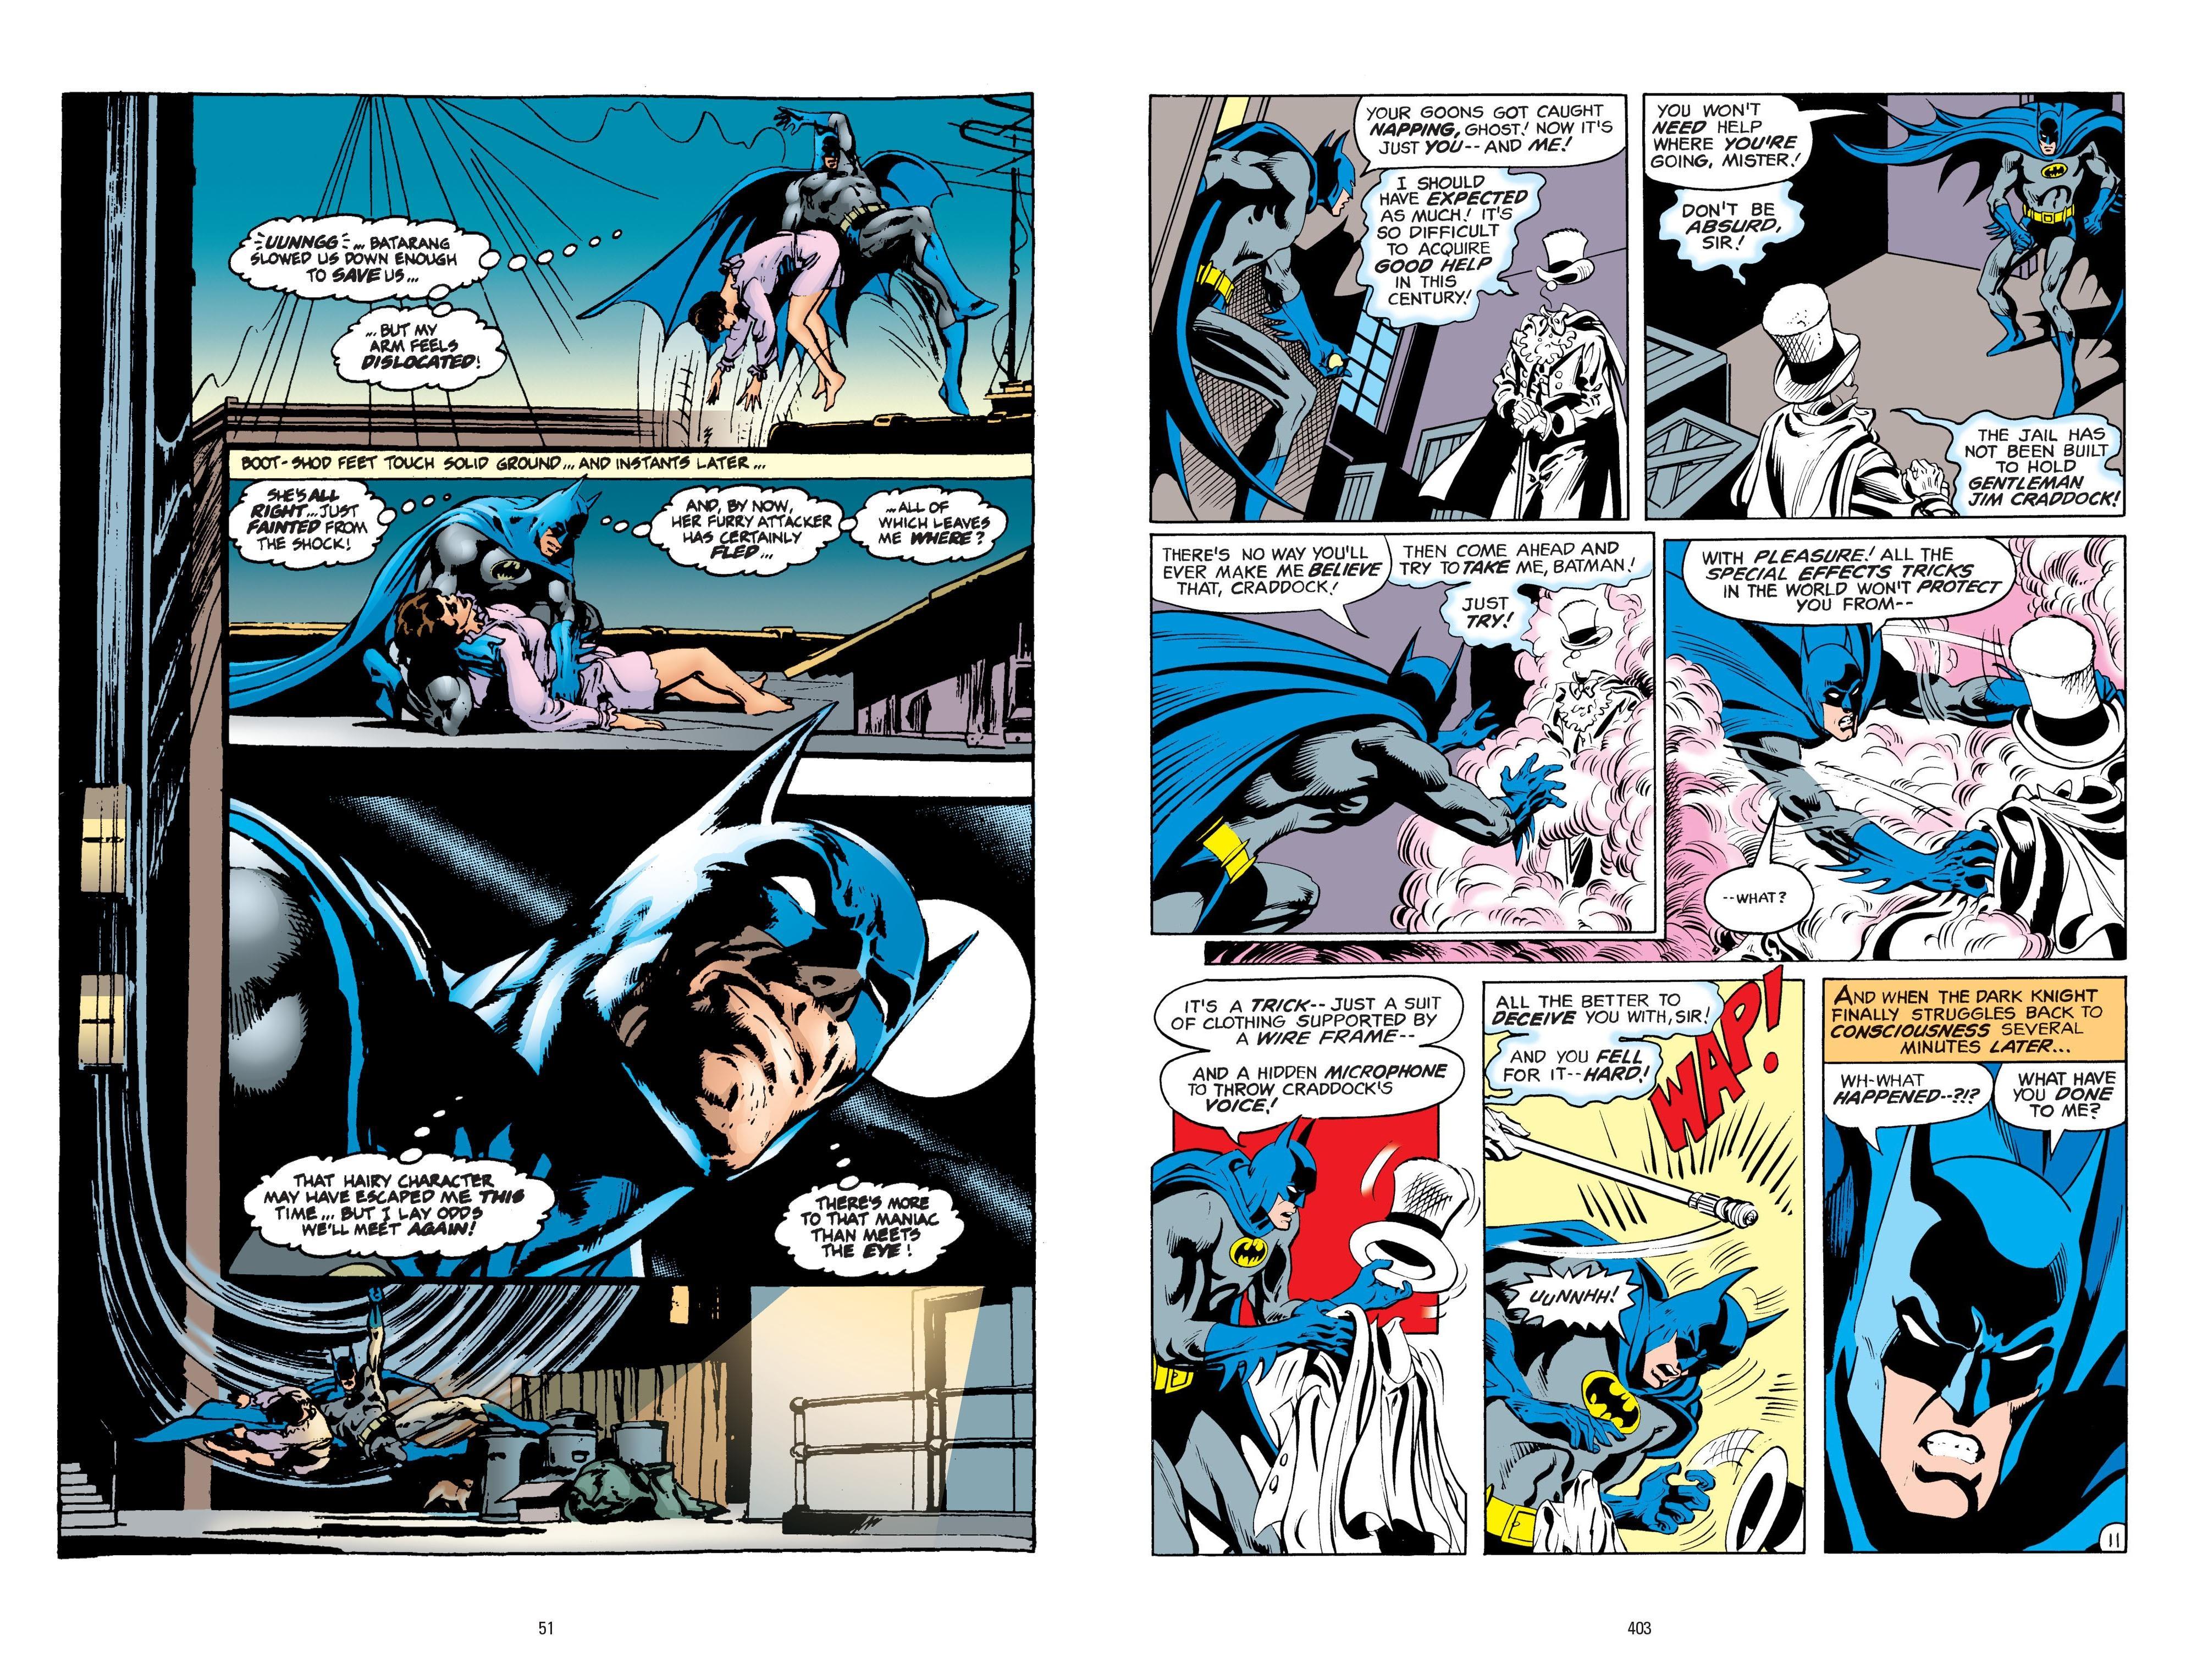 Tales of the Batman - Len Wein review